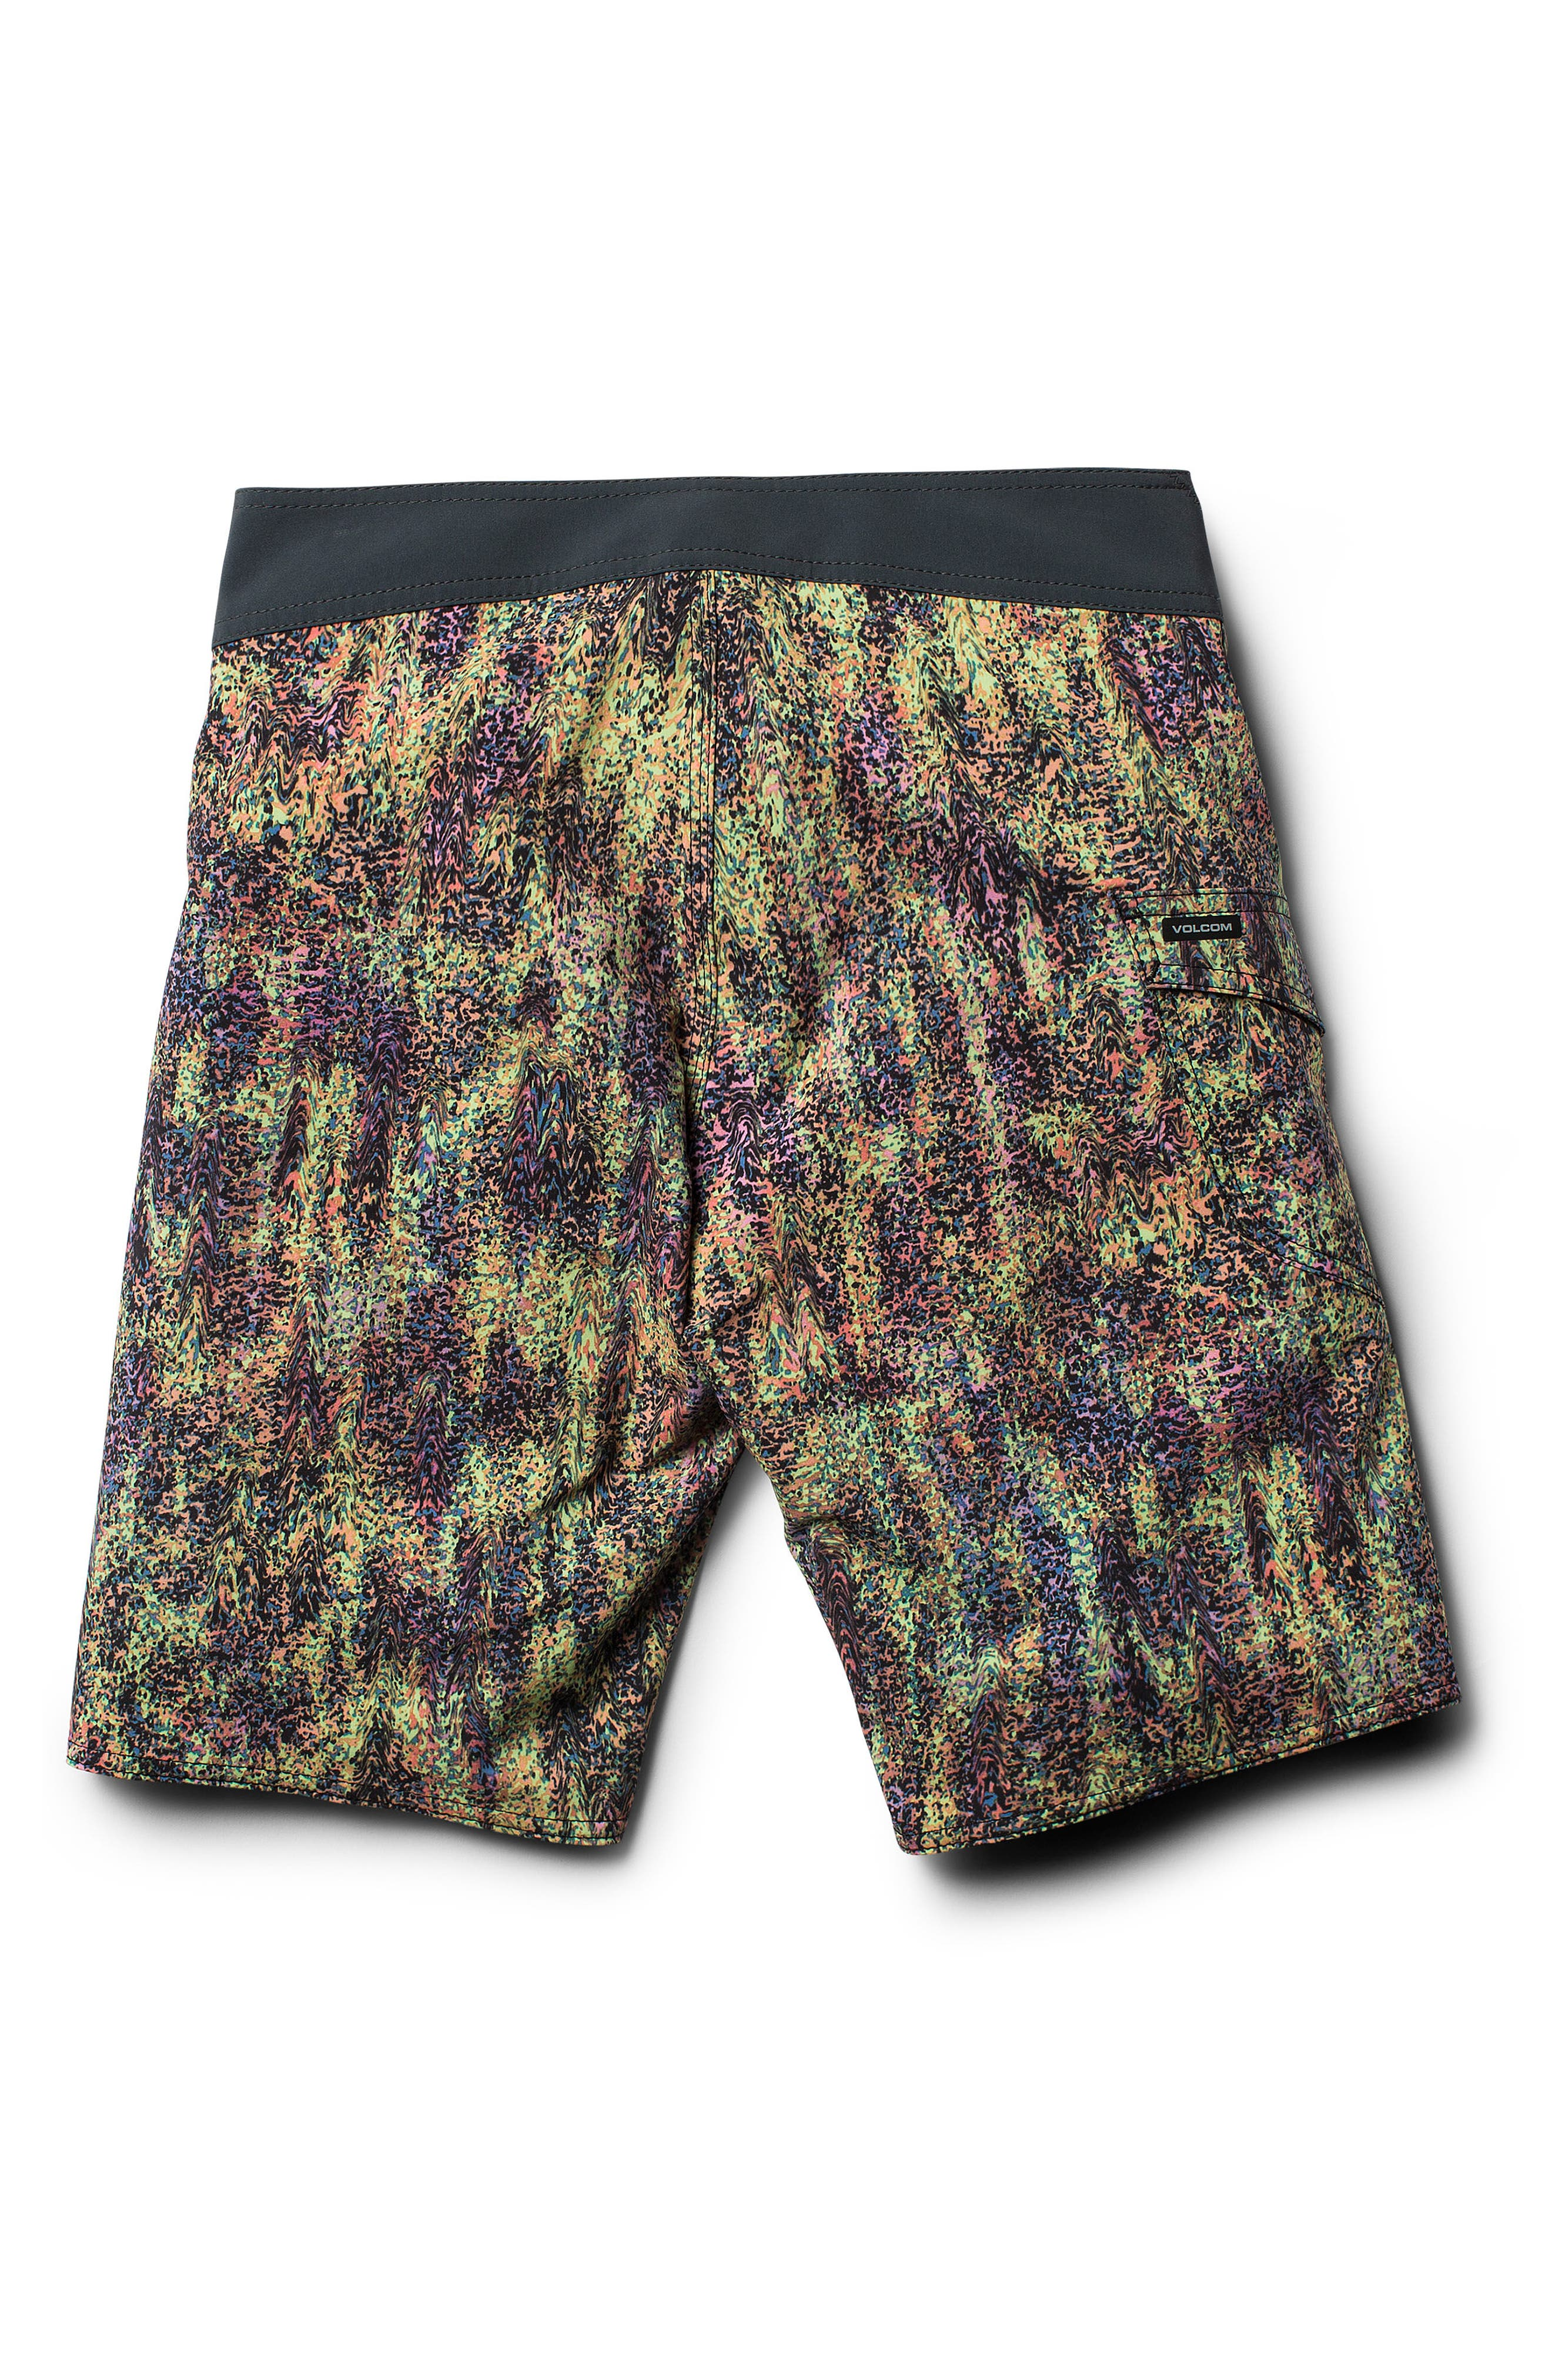 VOLCOM,                             Plasm Mod Board Shorts,                             Alternate thumbnail 2, color,                             020